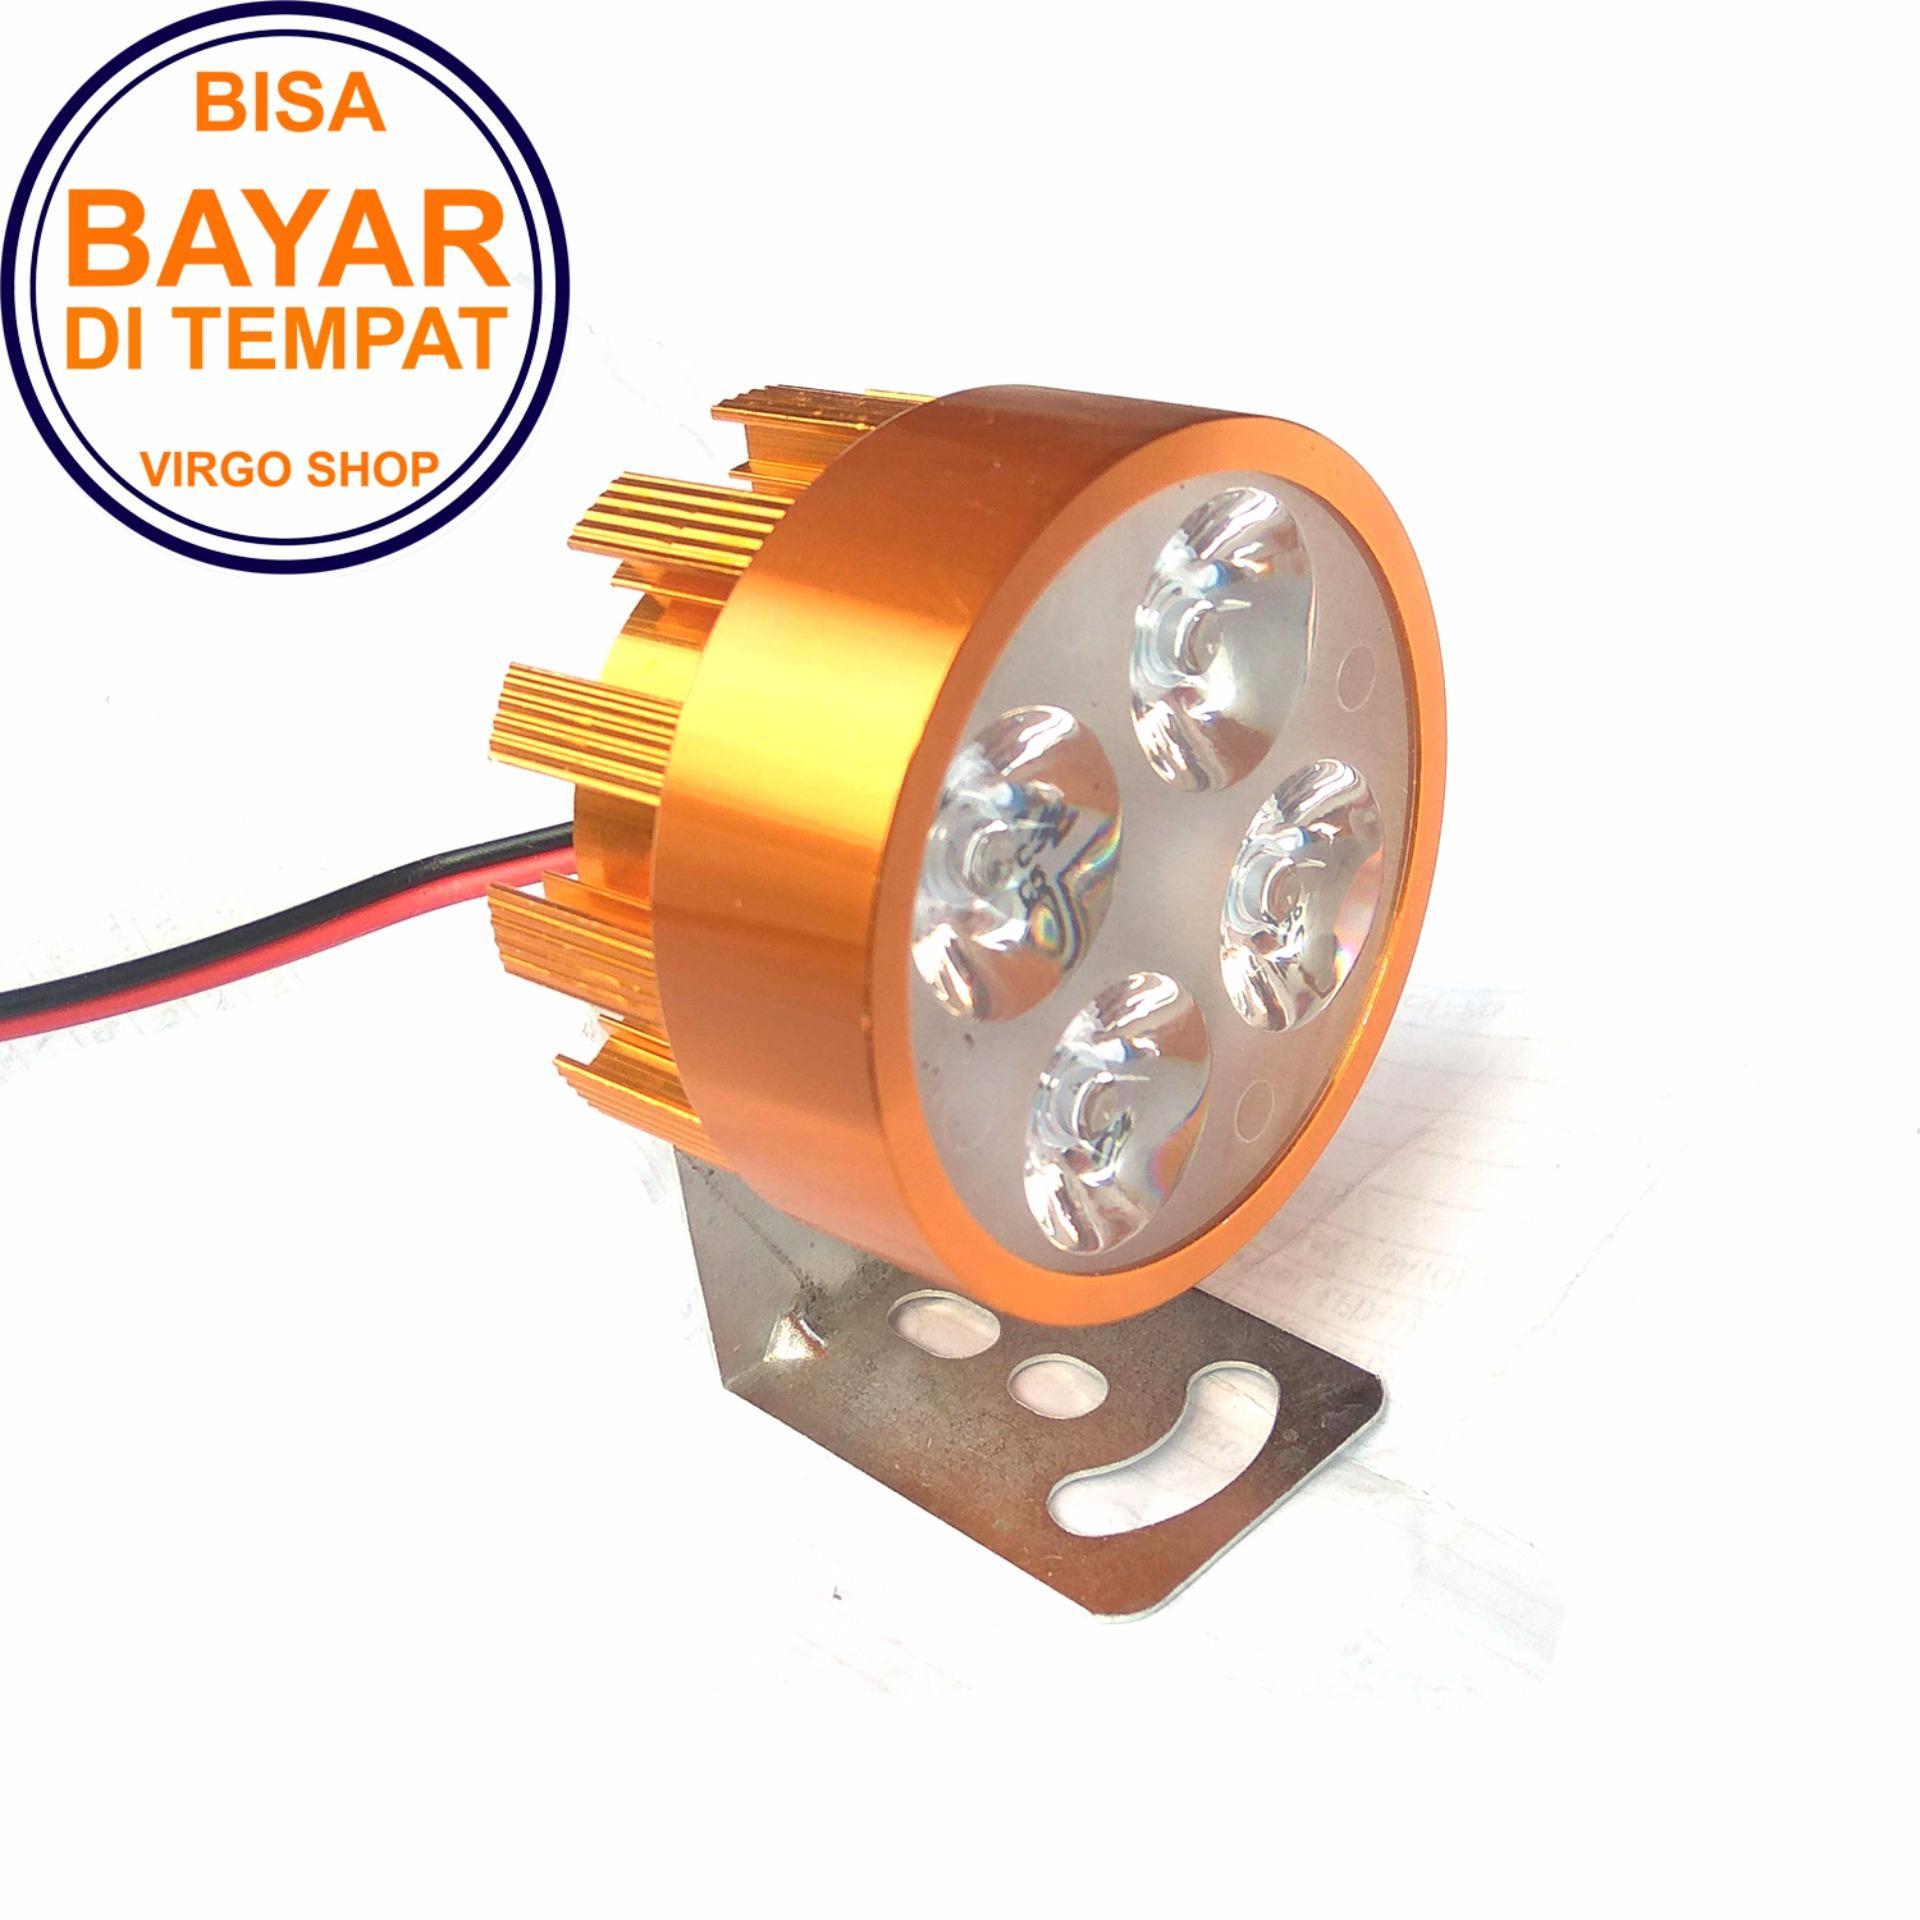 Lampu Sorot LED 4 Mata Sorot Putih Untuk Lampu Tambahan Penerangan - Gold